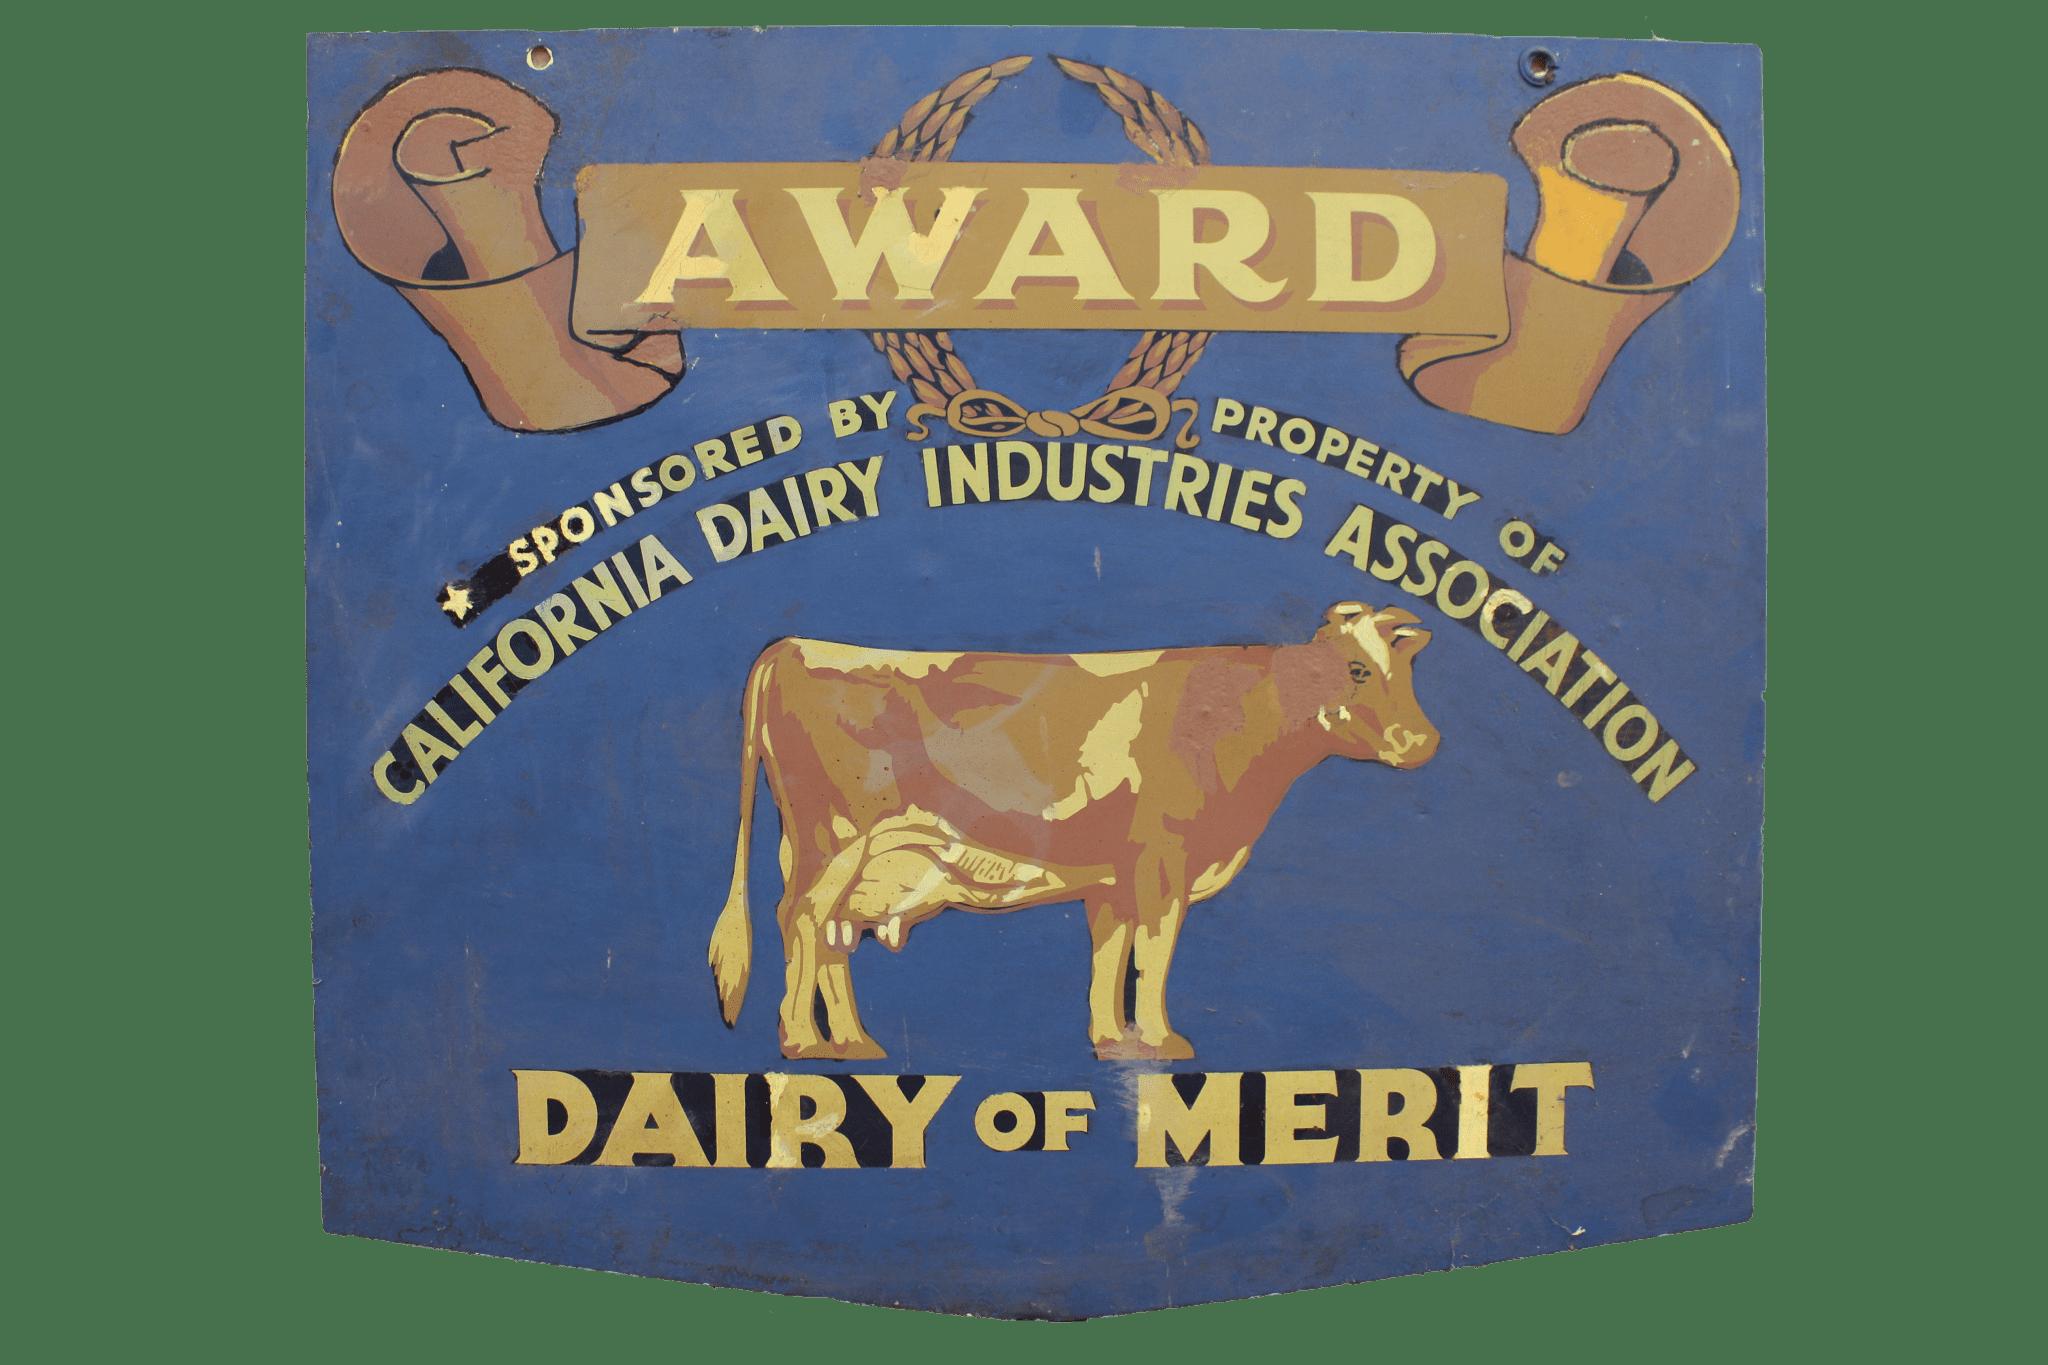 California Dairy Industries Association Dairy of Merit Award